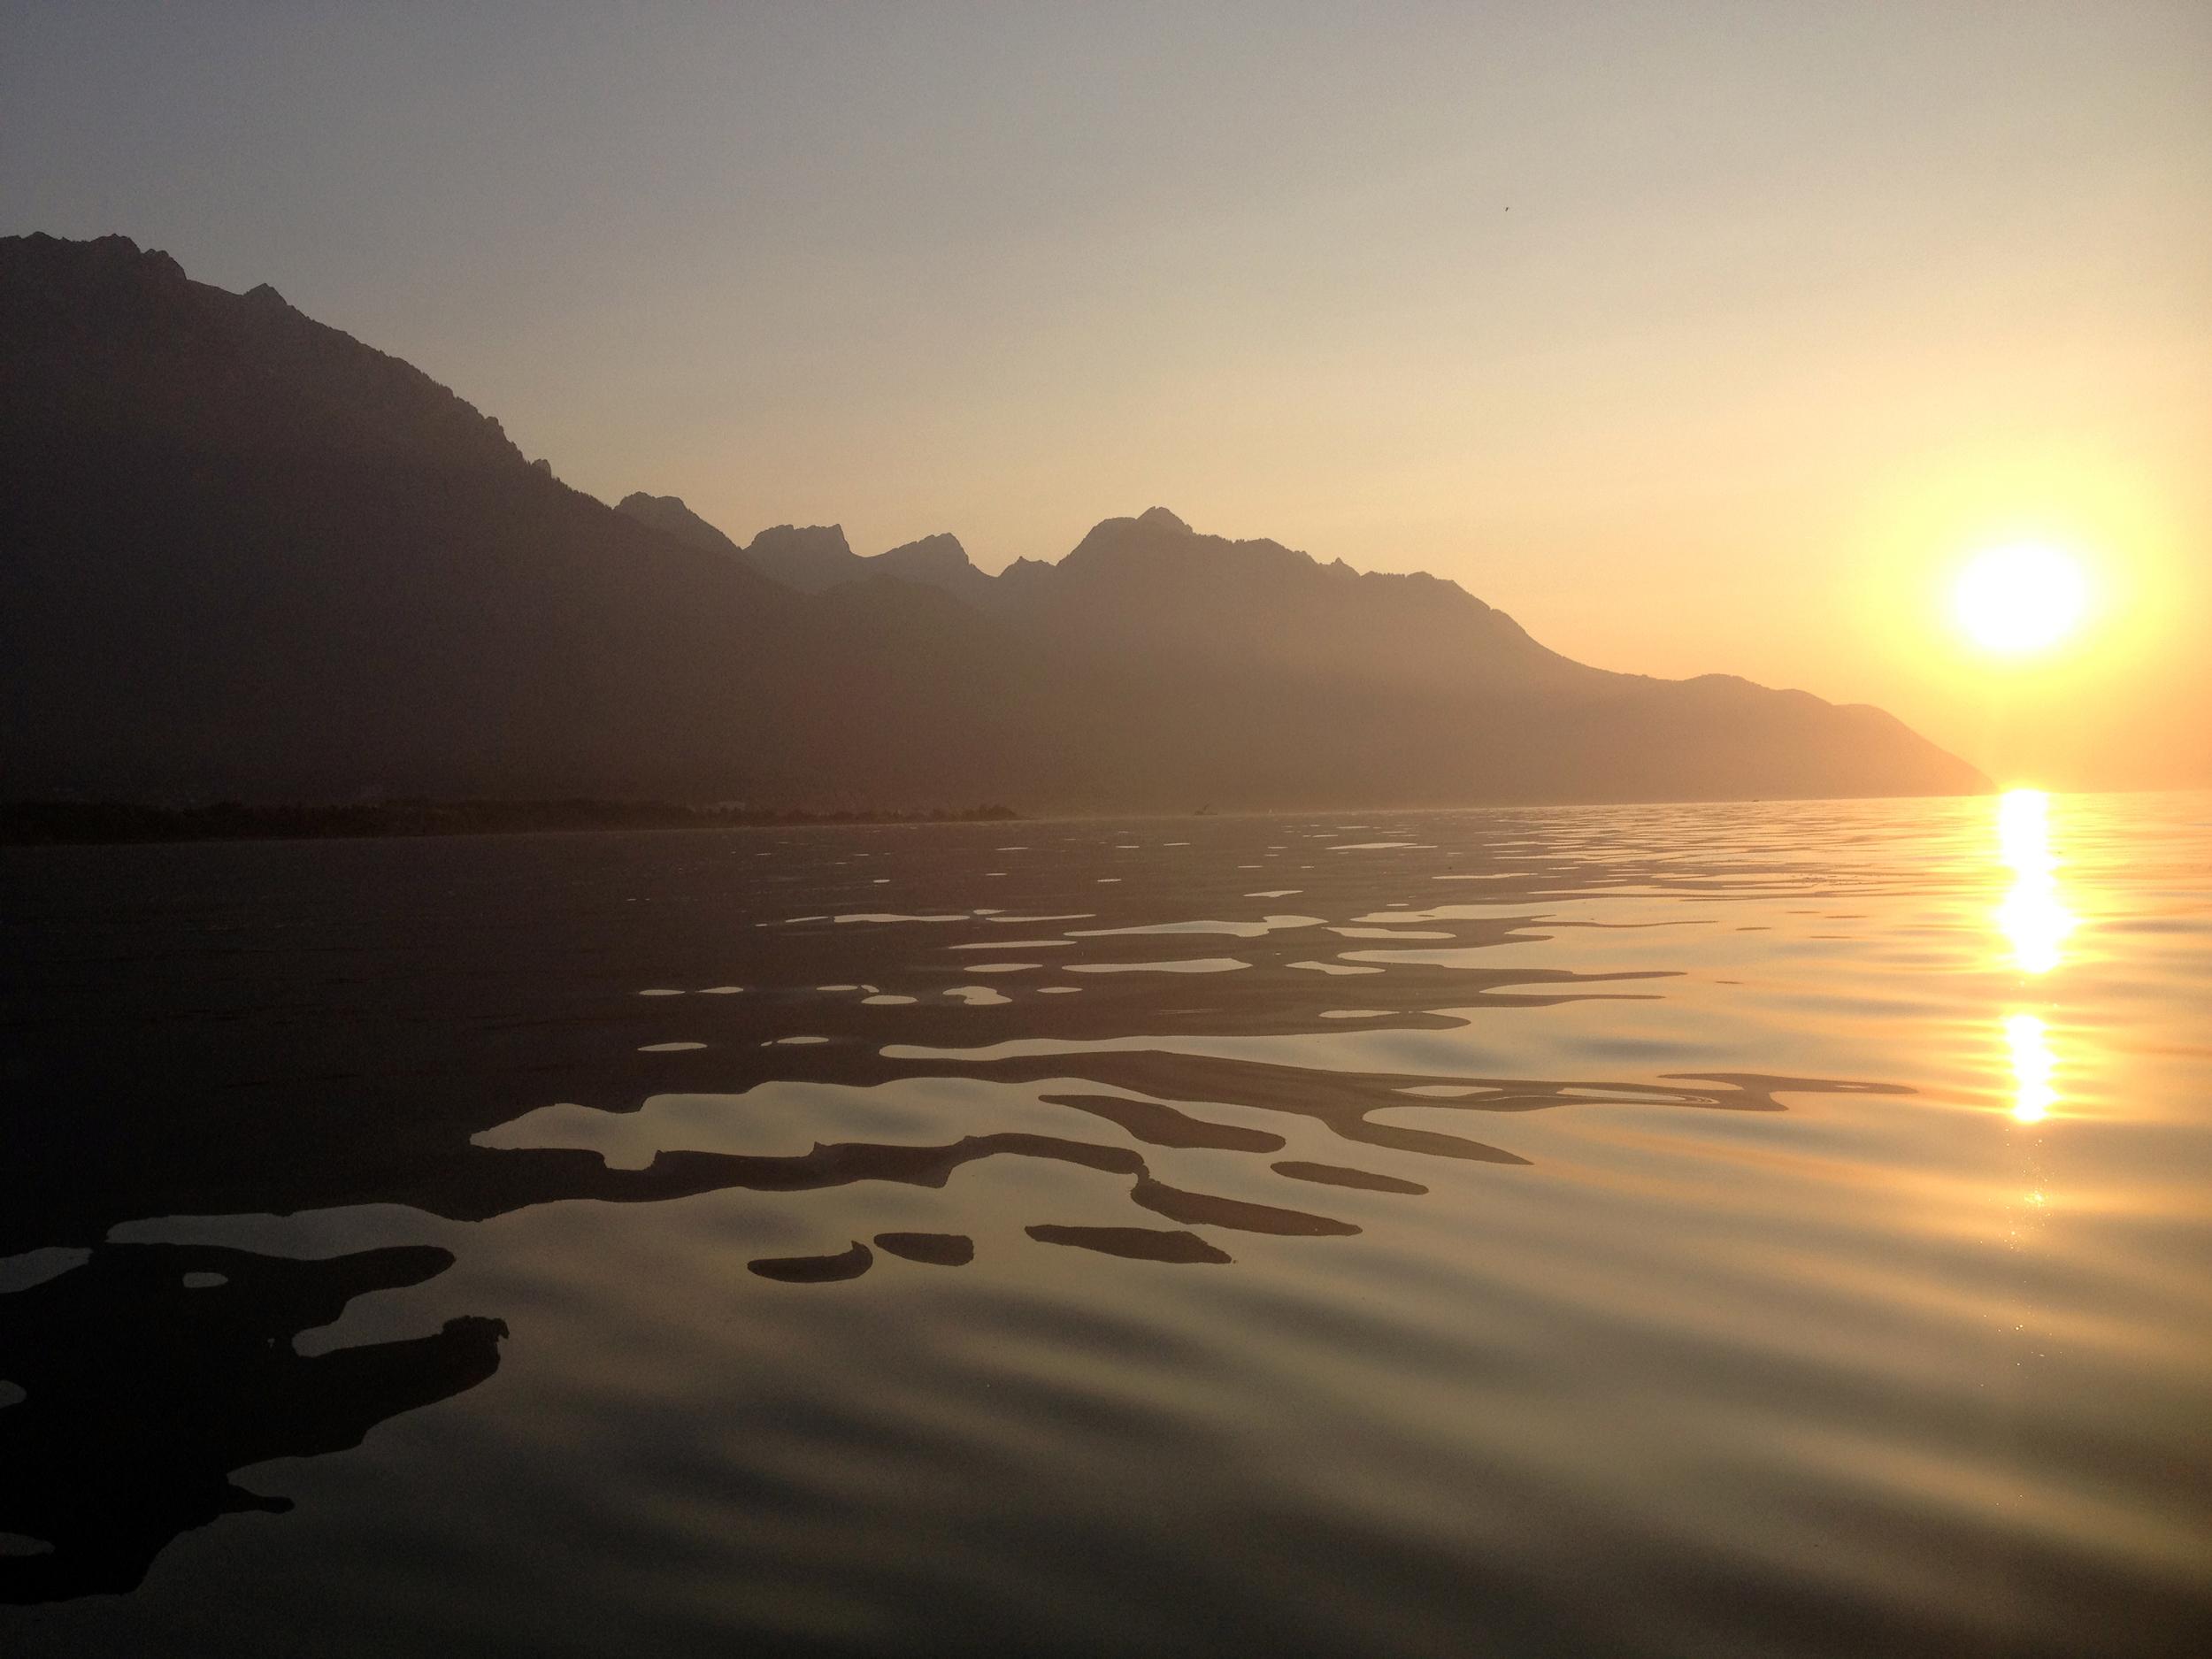 Lac Léman canoeing